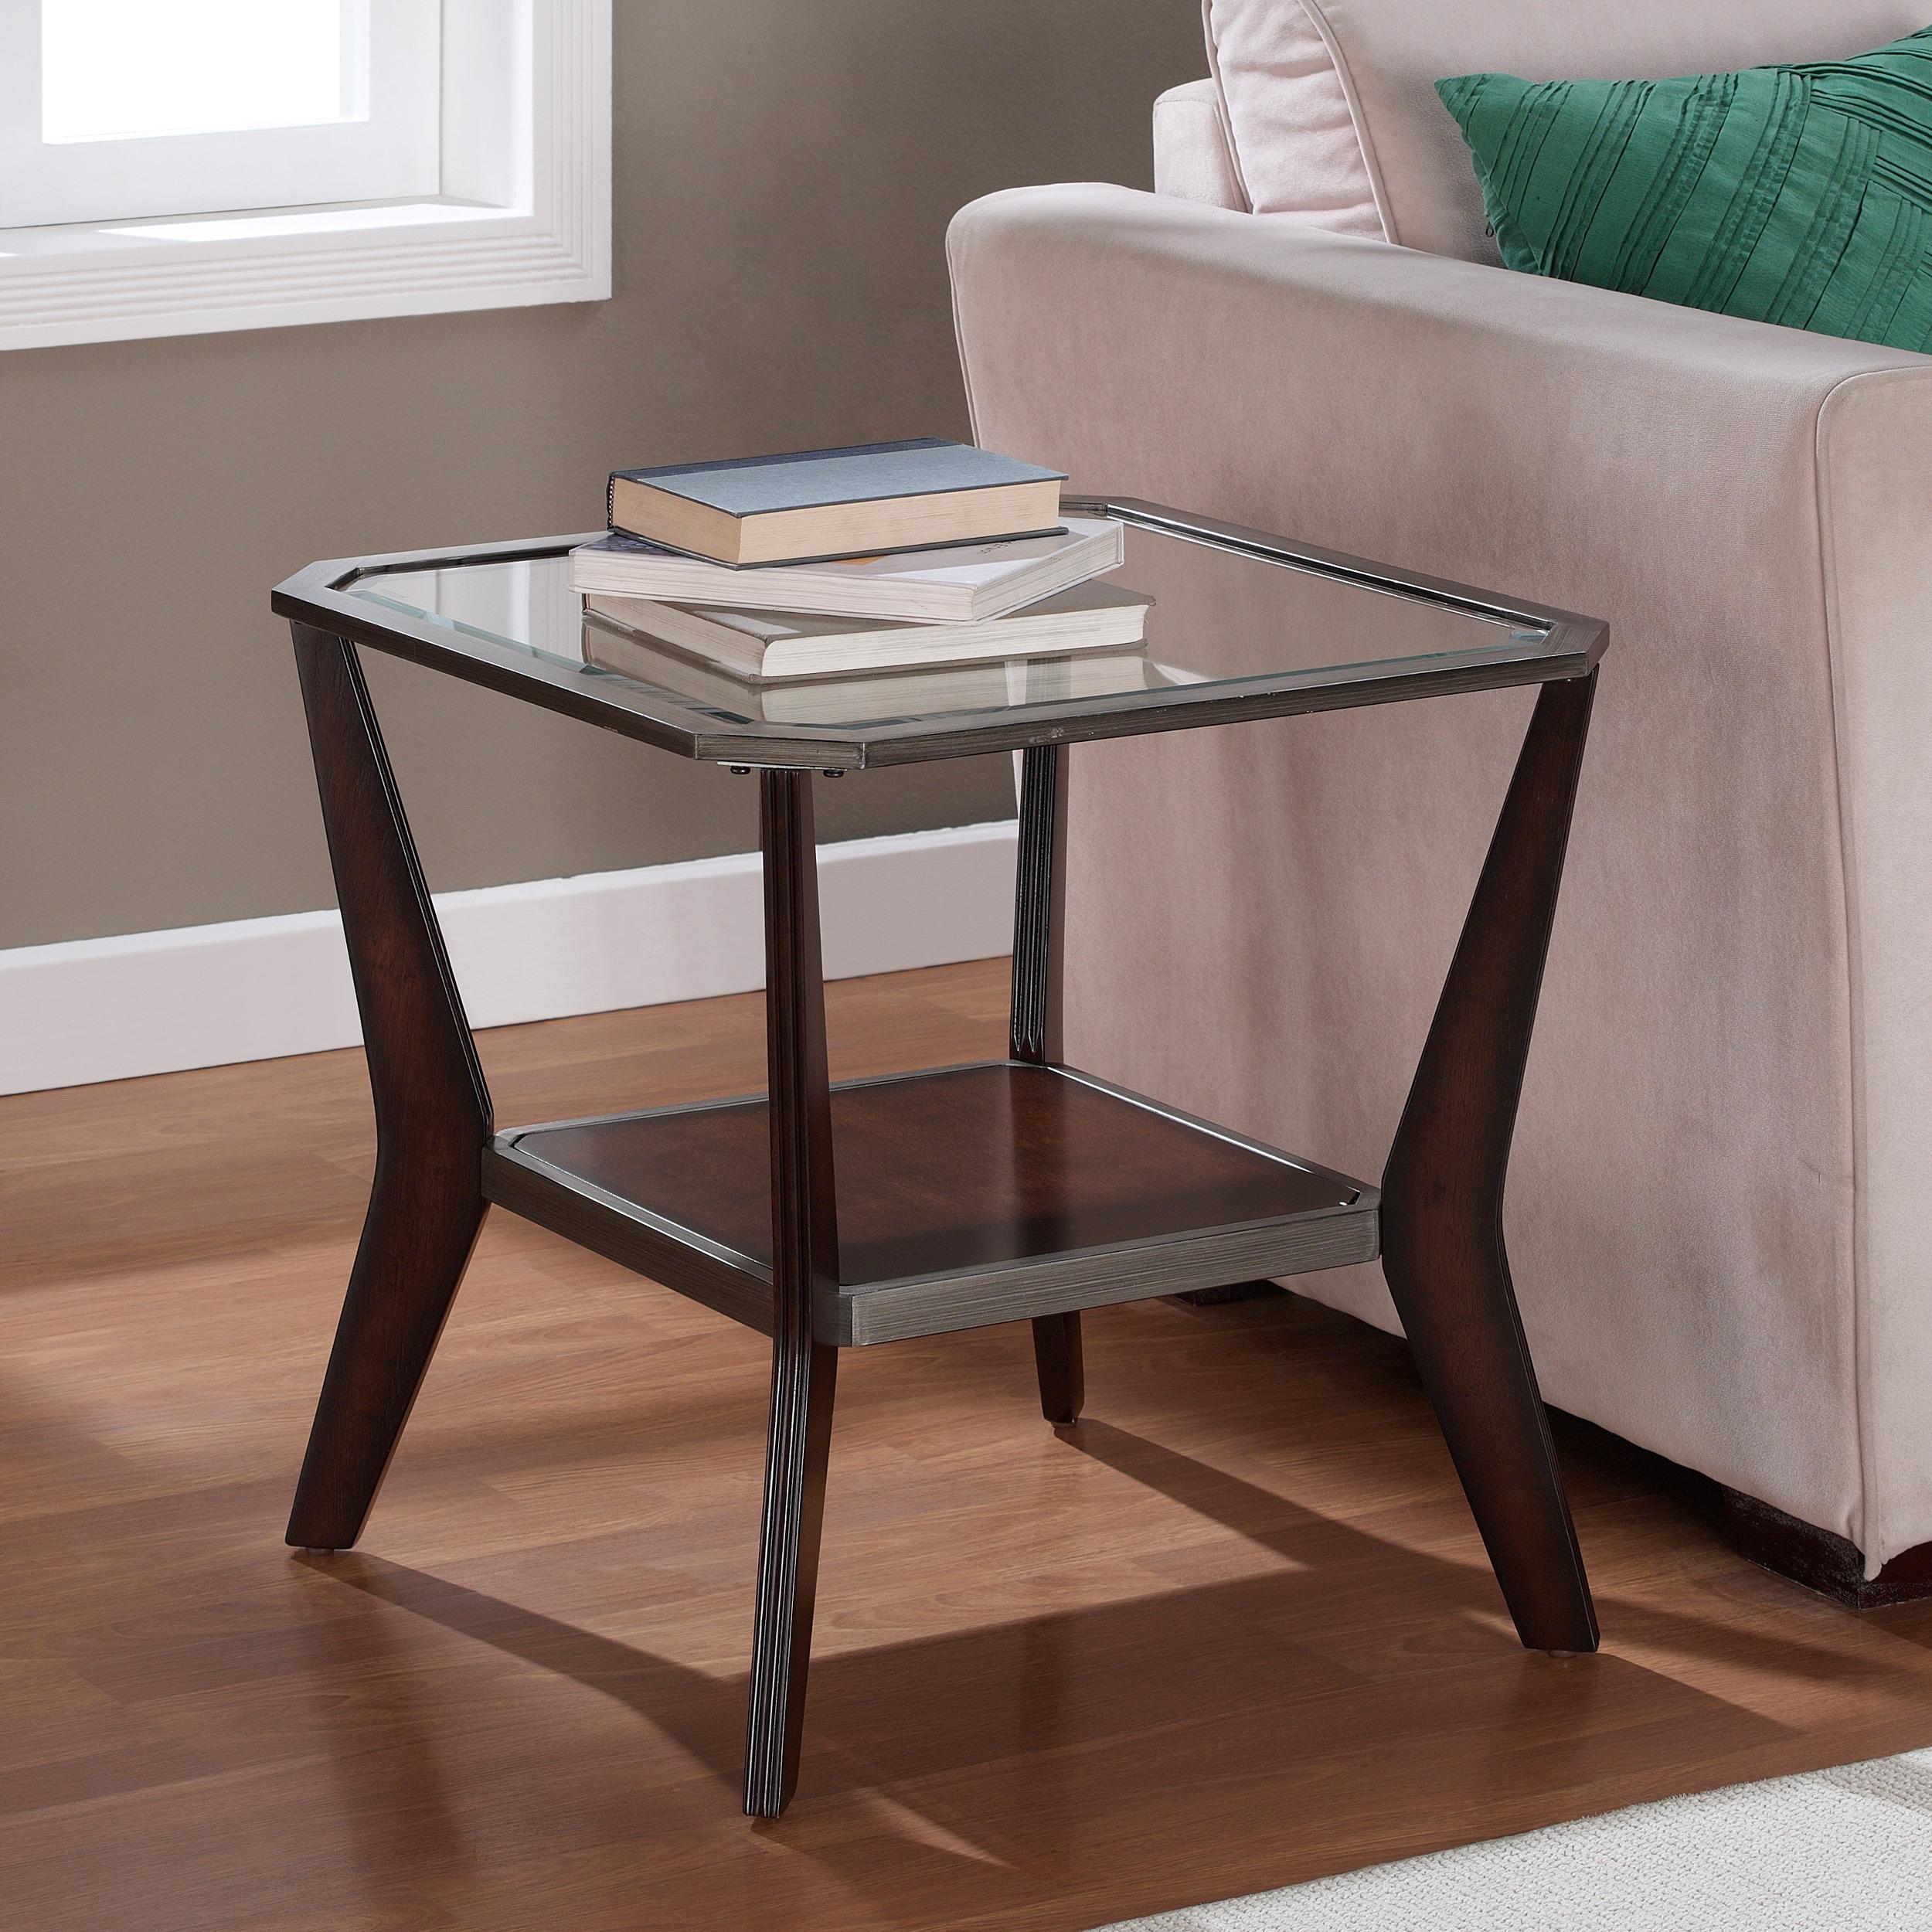 Shop Clay Alder Home Boomerang Espresso/ Antique Silver End Table   Free  Shipping Today   Overstock.com   7685141